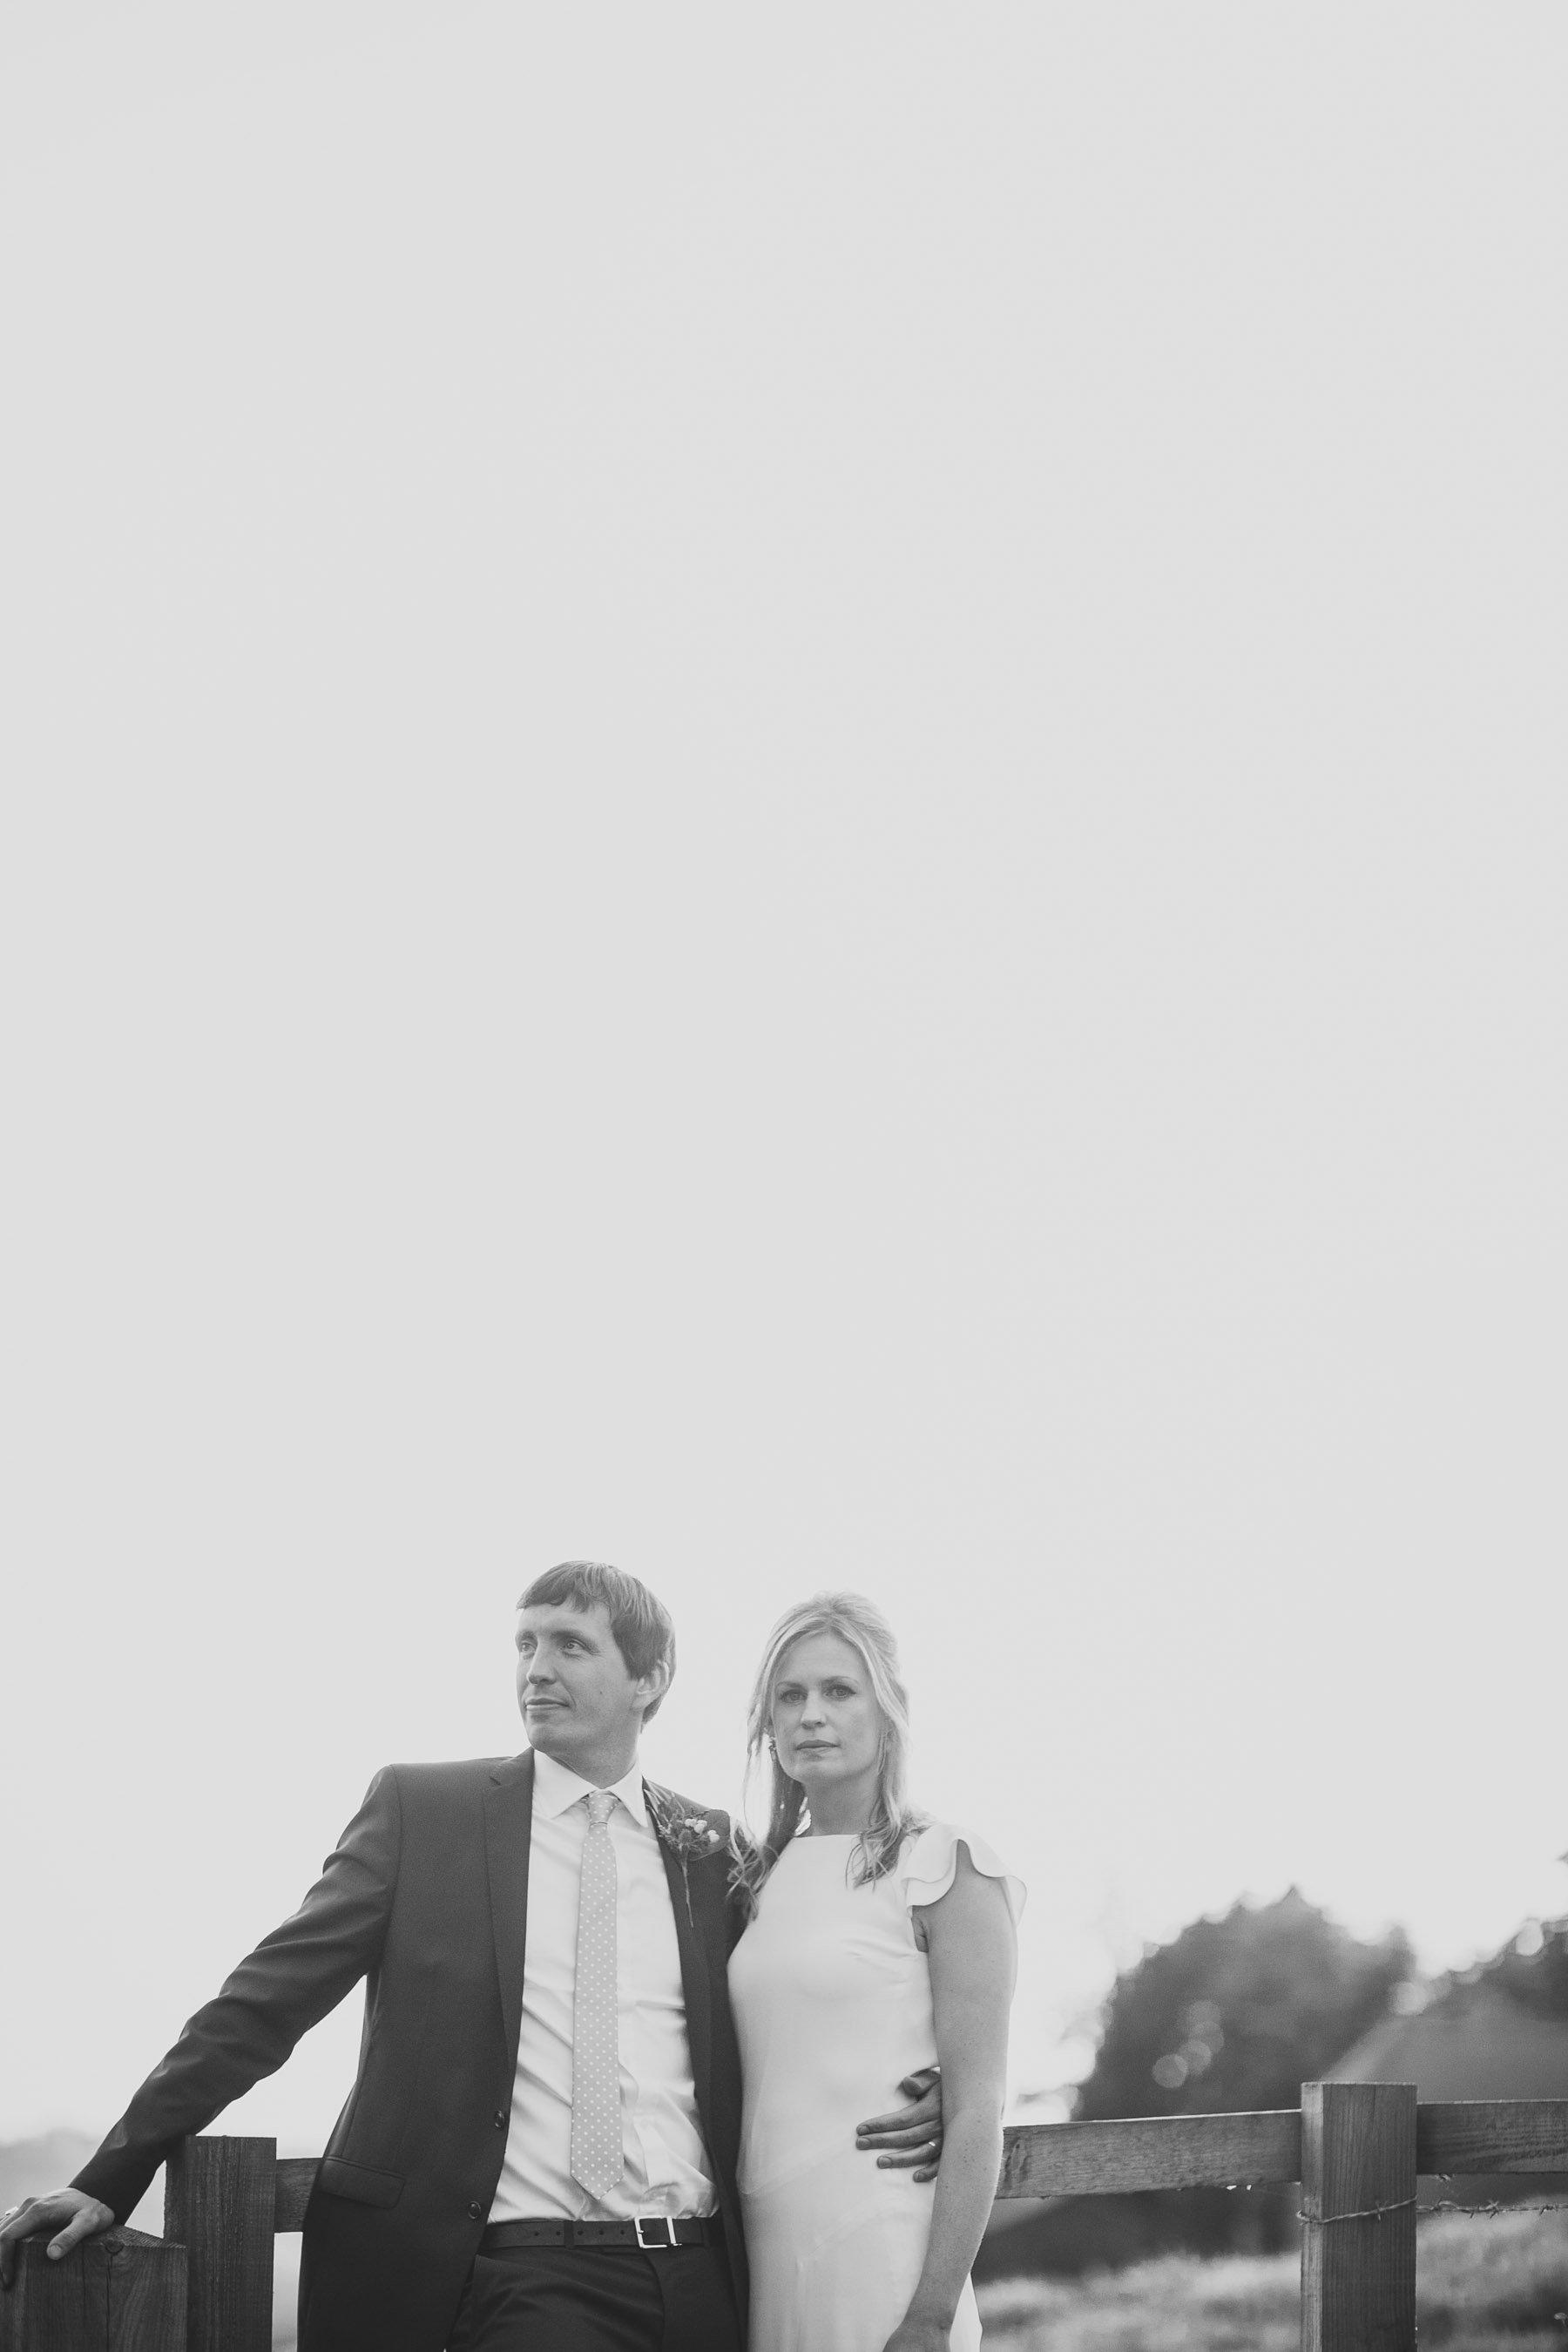 Buckinghamshire-Wedding-Lizzie-Duncan-124